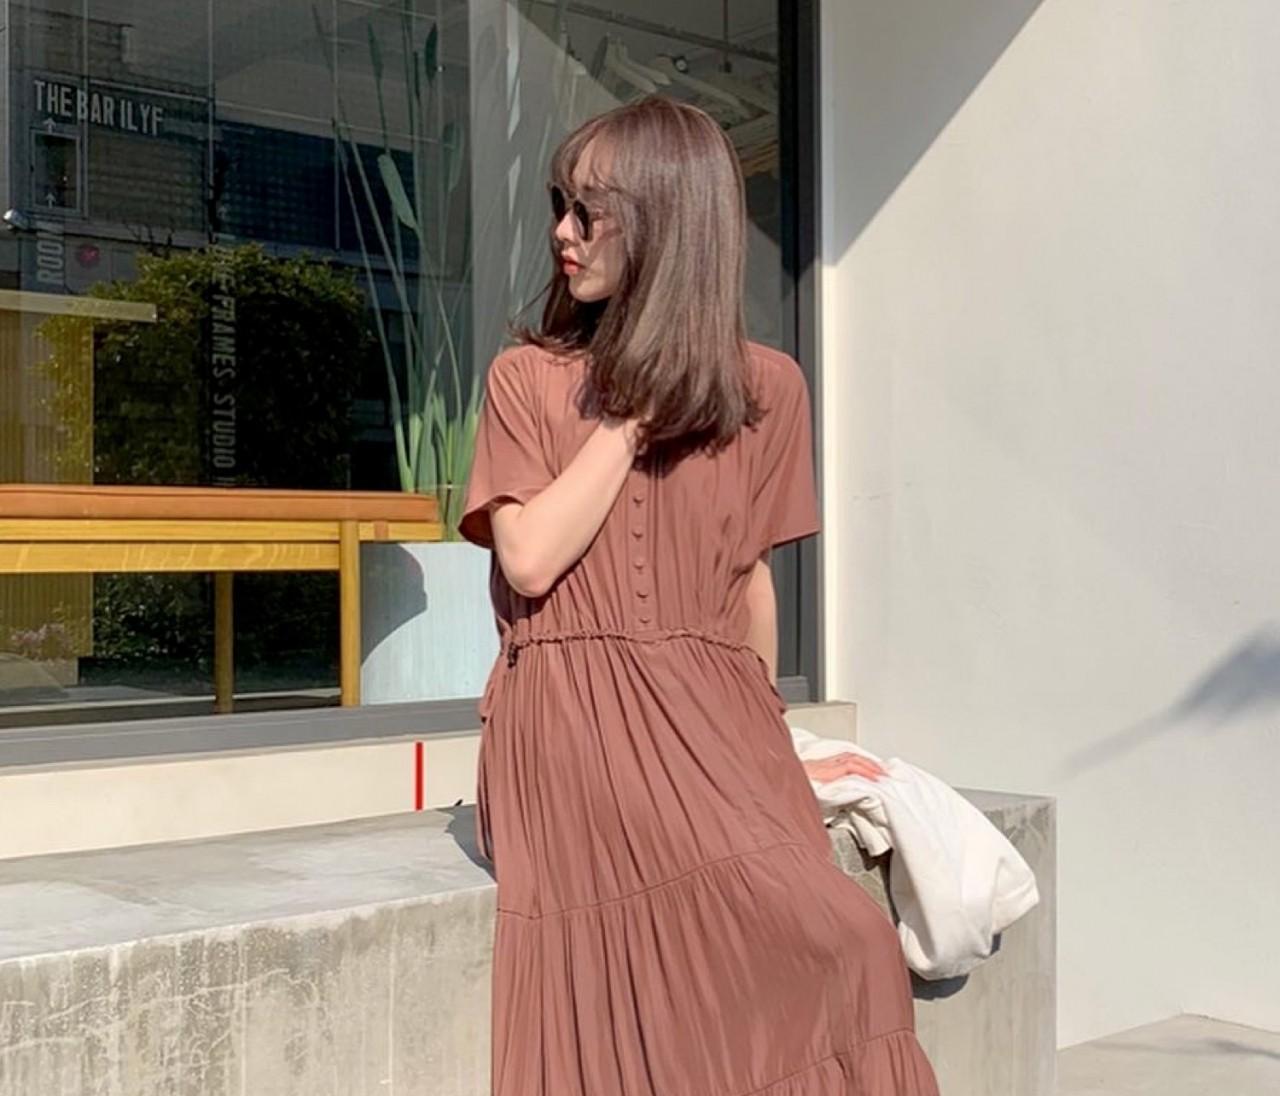 ALLプチプラ♡服&サンダルは「ブラウン」投入で高見え狙い!